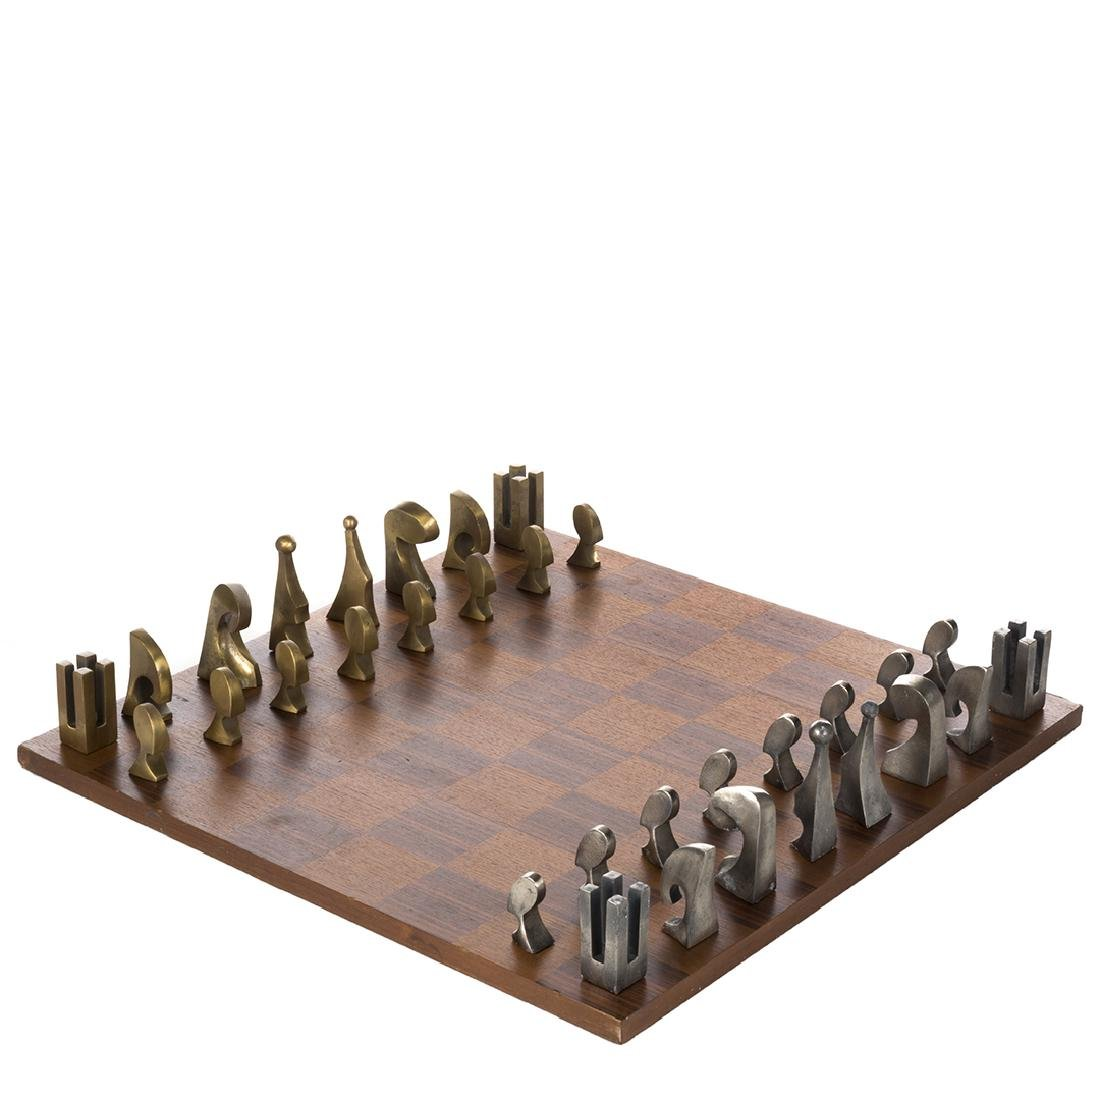 Pierre Cardin Evolution chess set